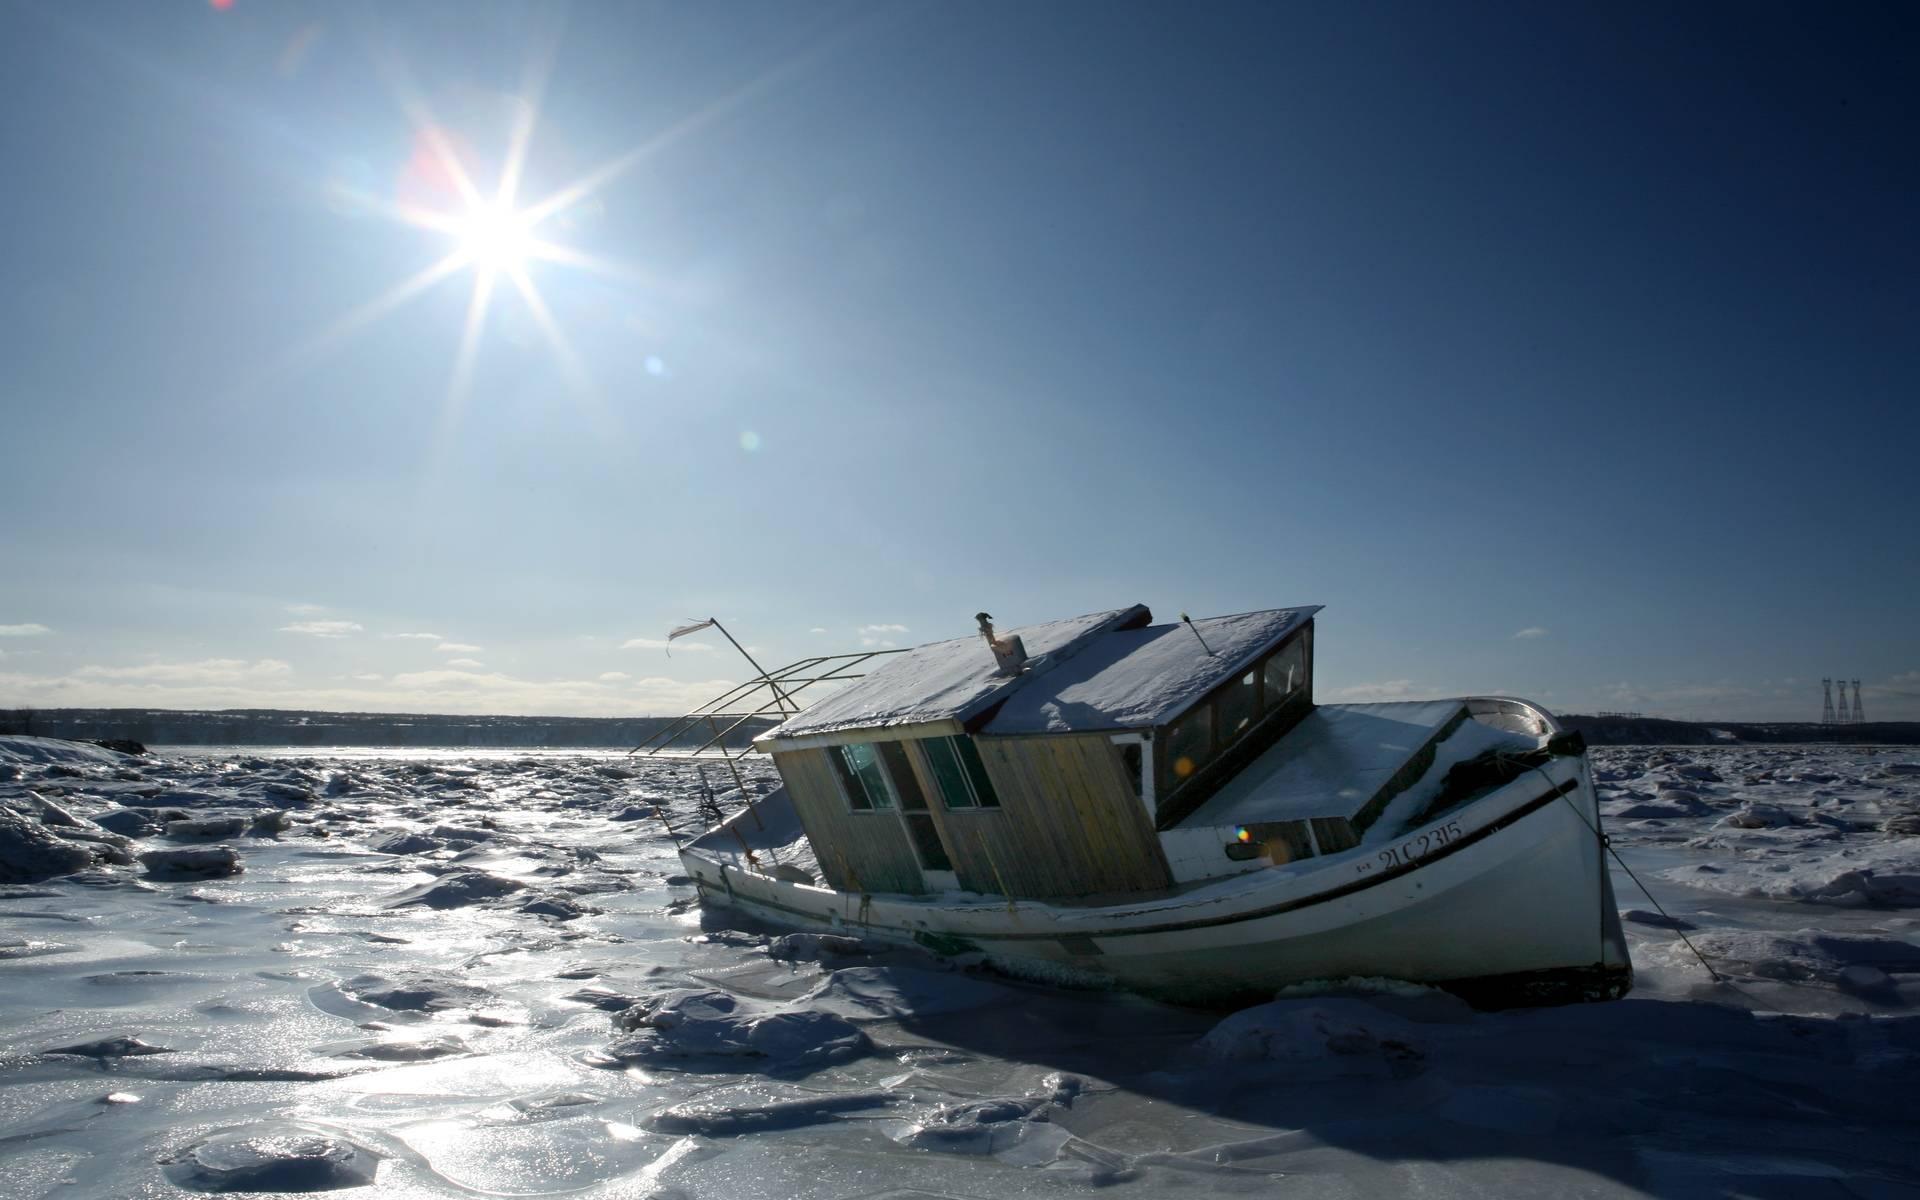 boat images